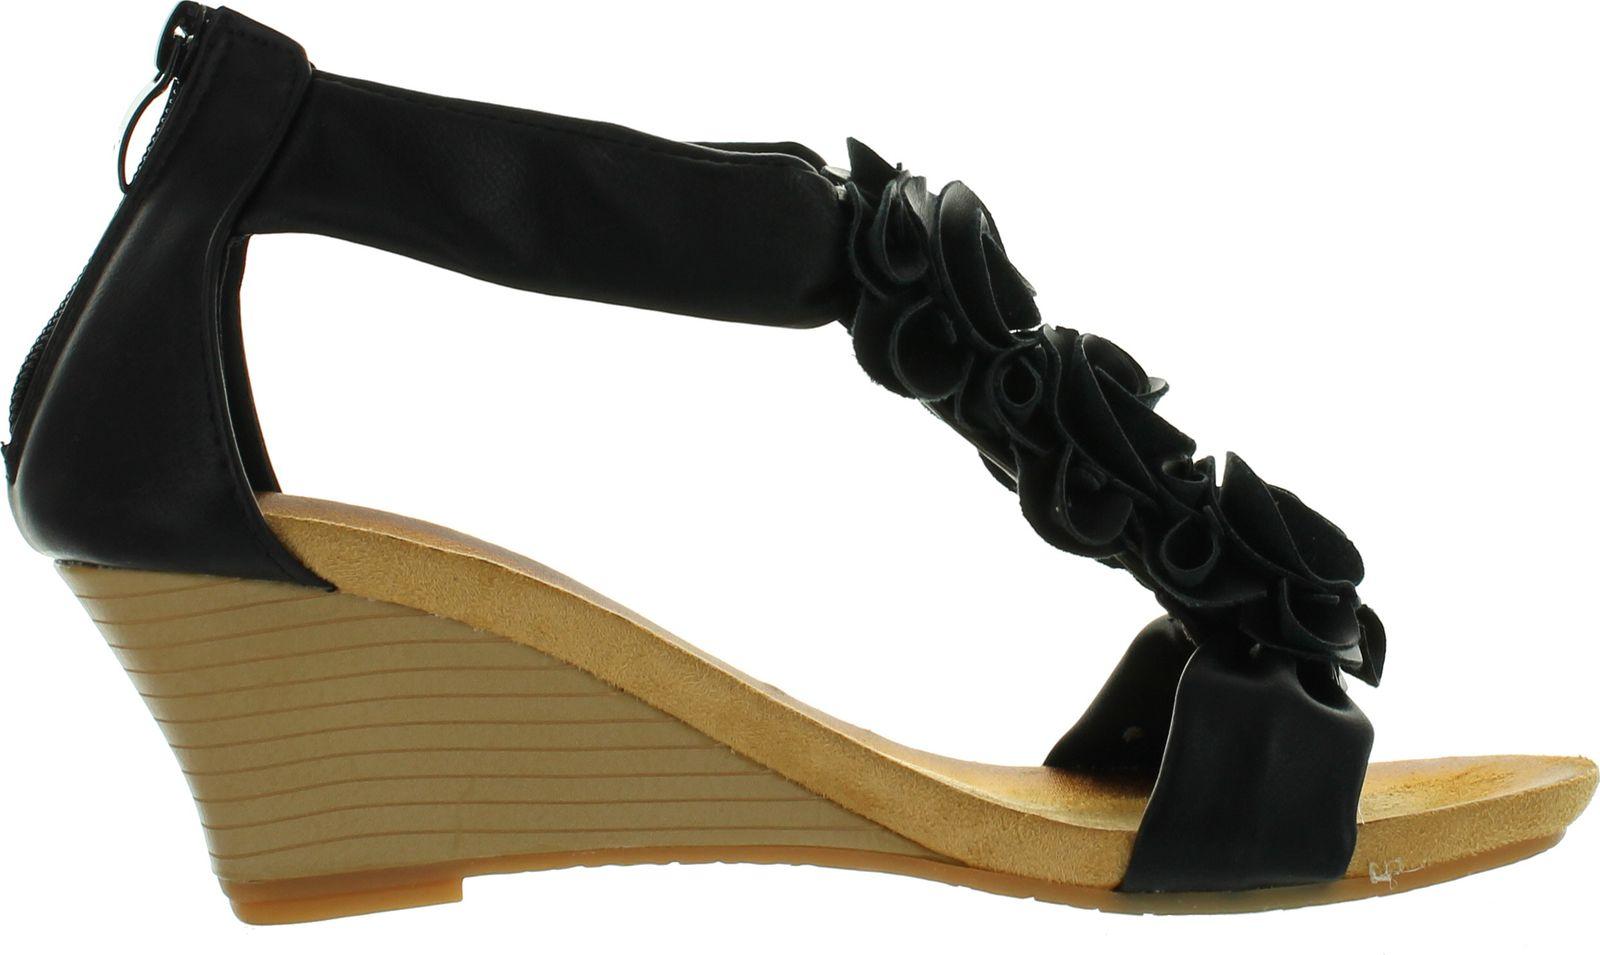 thumbnail 6 - PATRIZIA by Spring Step Womens Harlequin Fashion Wedge Sandals